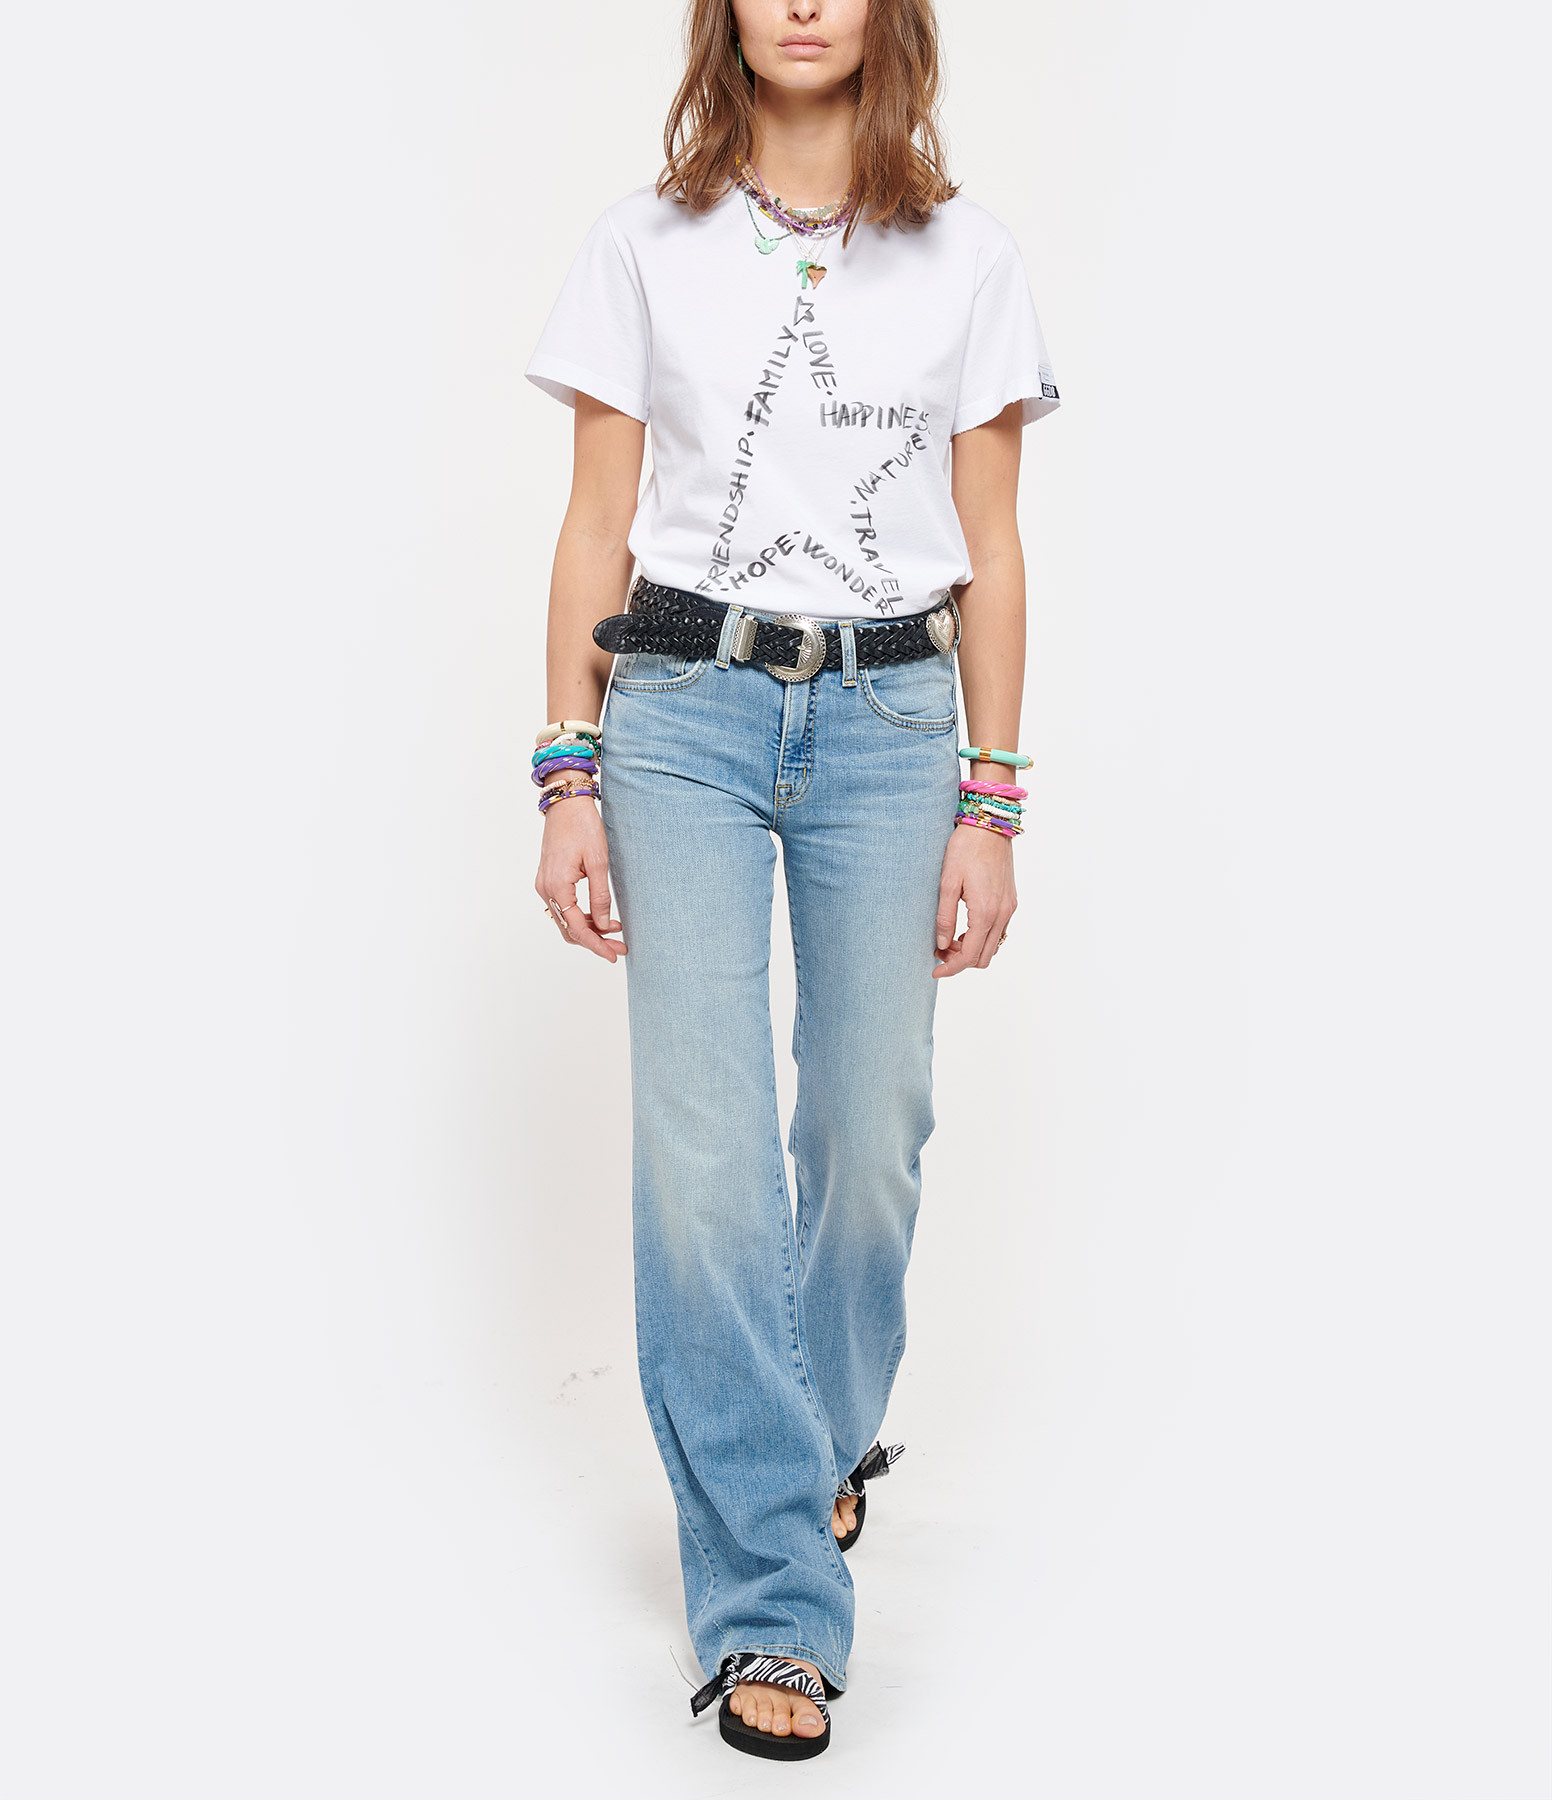 GOLDEN GOOSE - Tee-shirt Ania Étoile Coton Blanc